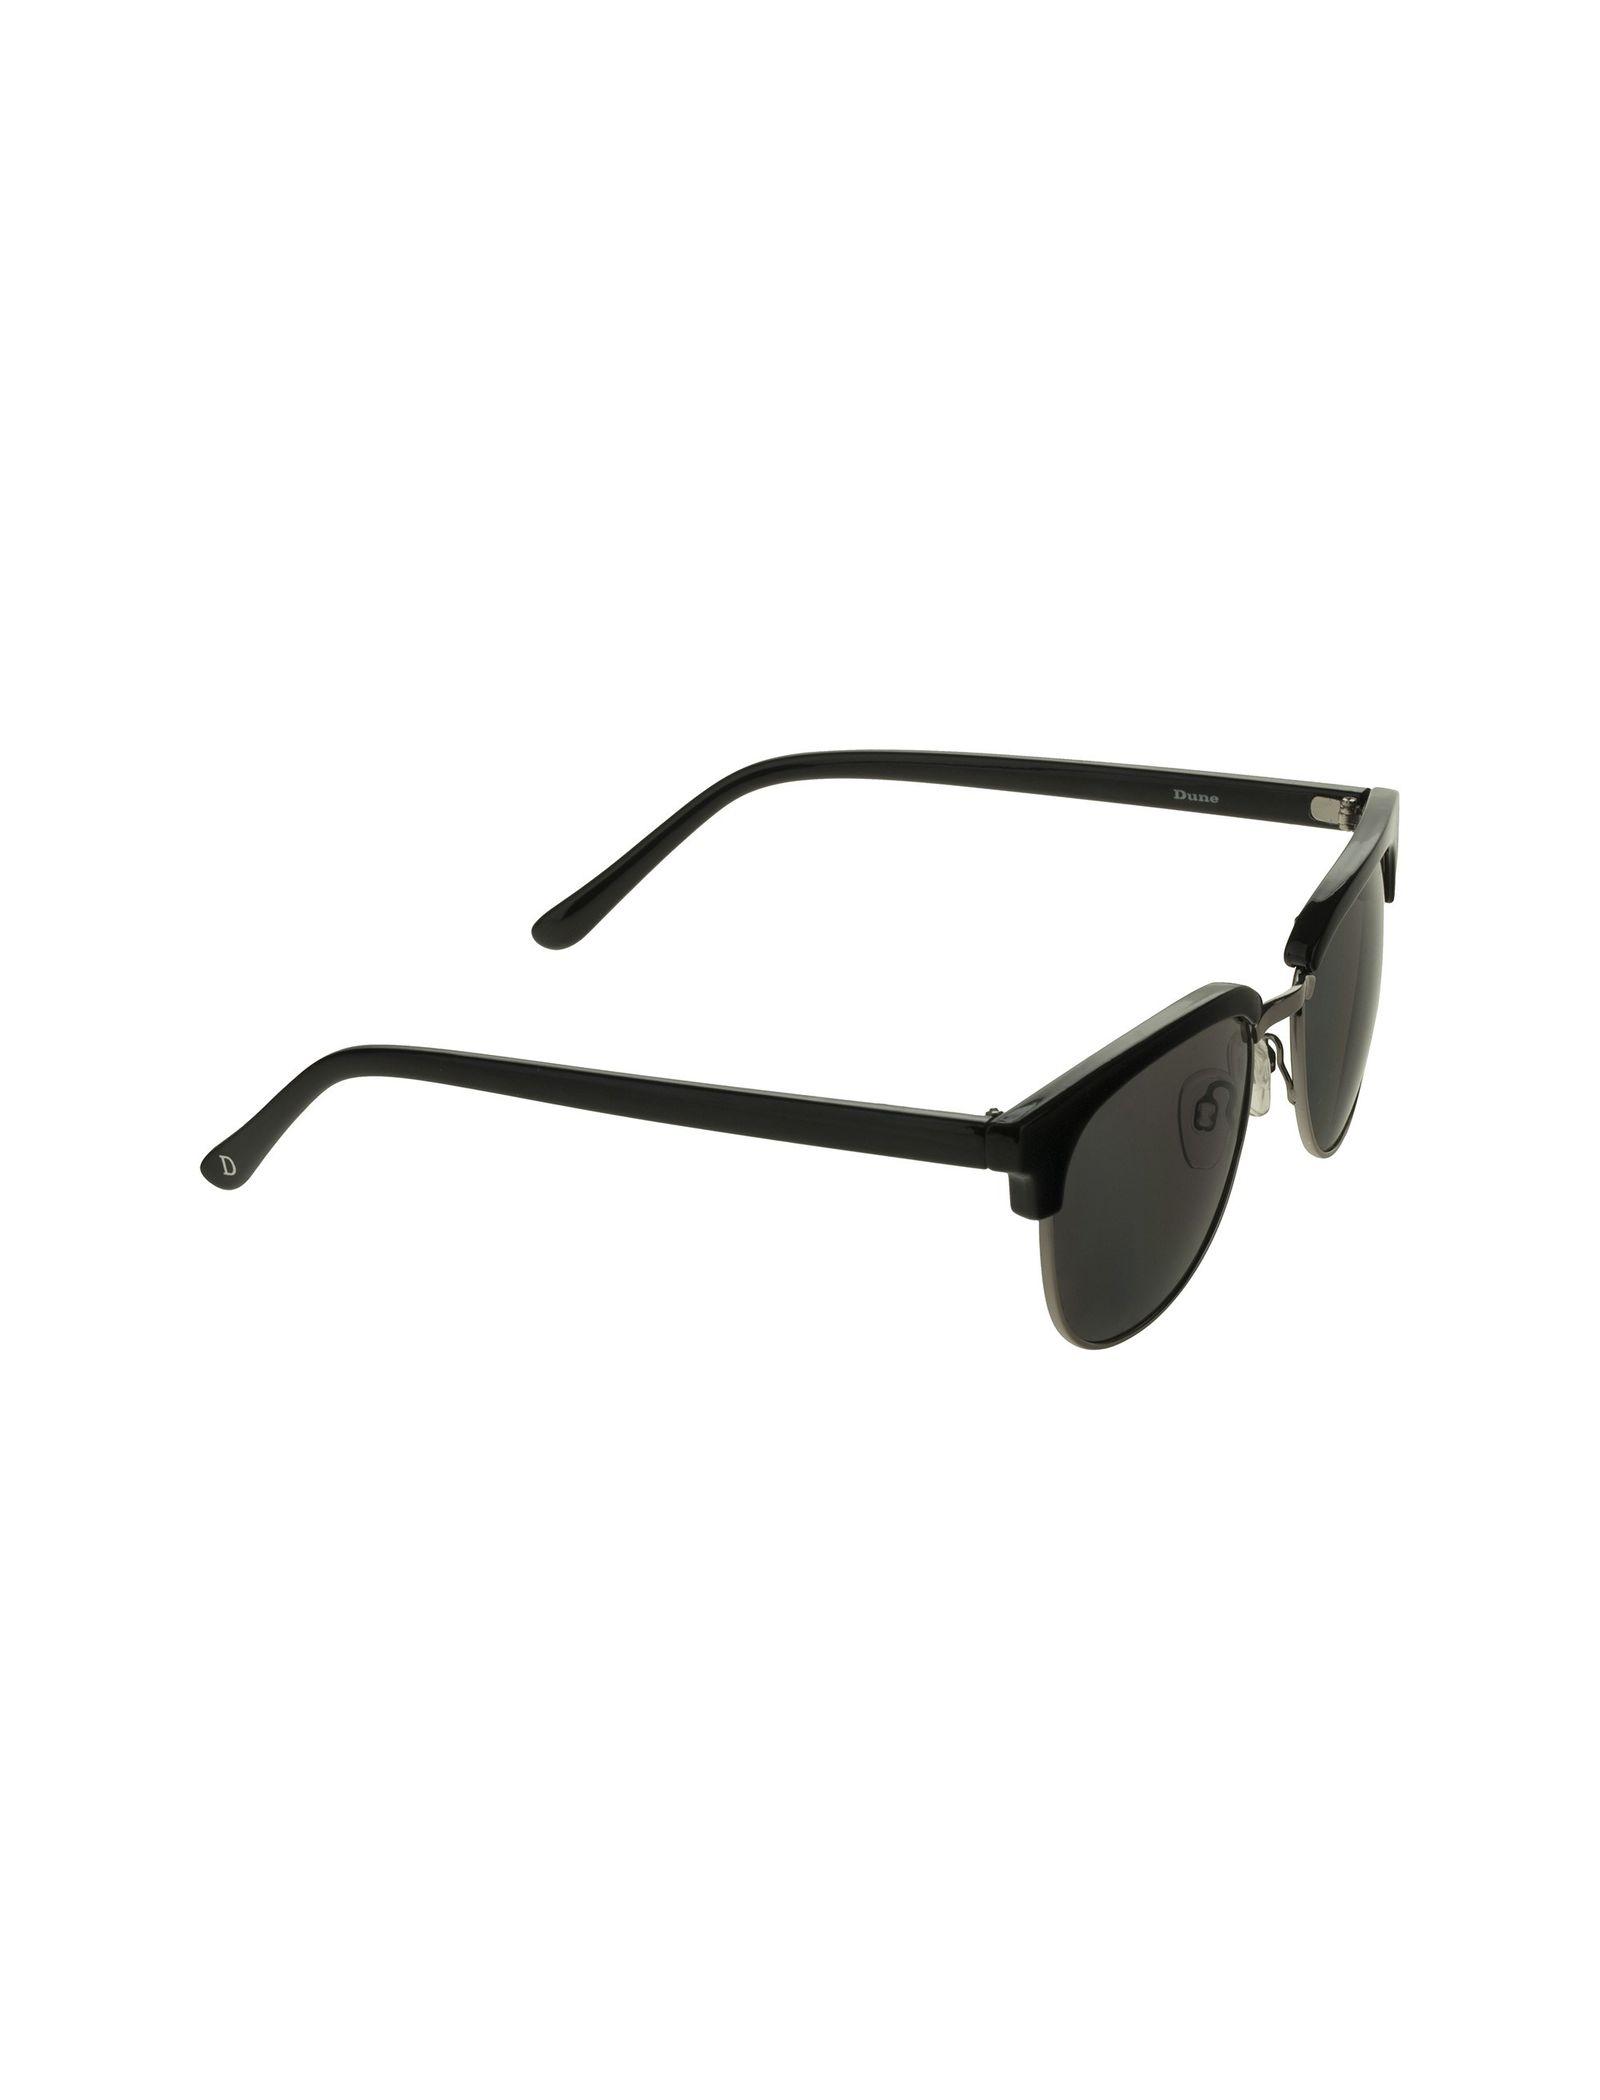 عینک آفتابی کلاب مستر مردانه - دون لندن - مشکي - 4